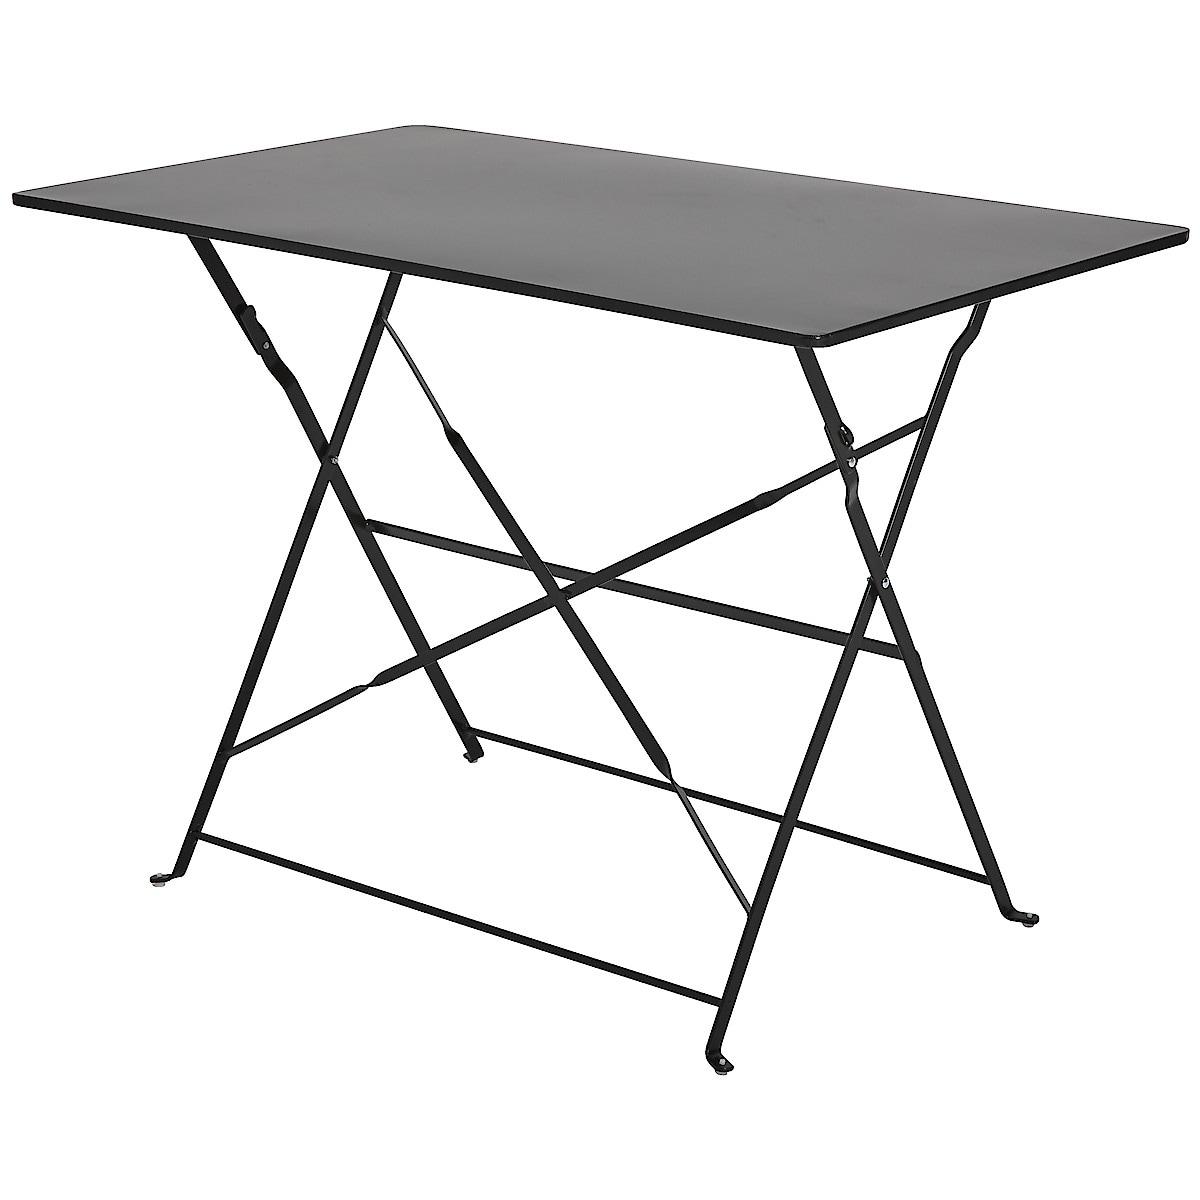 Hopfällbart bord, utemöbler metall | Clas Ohlson